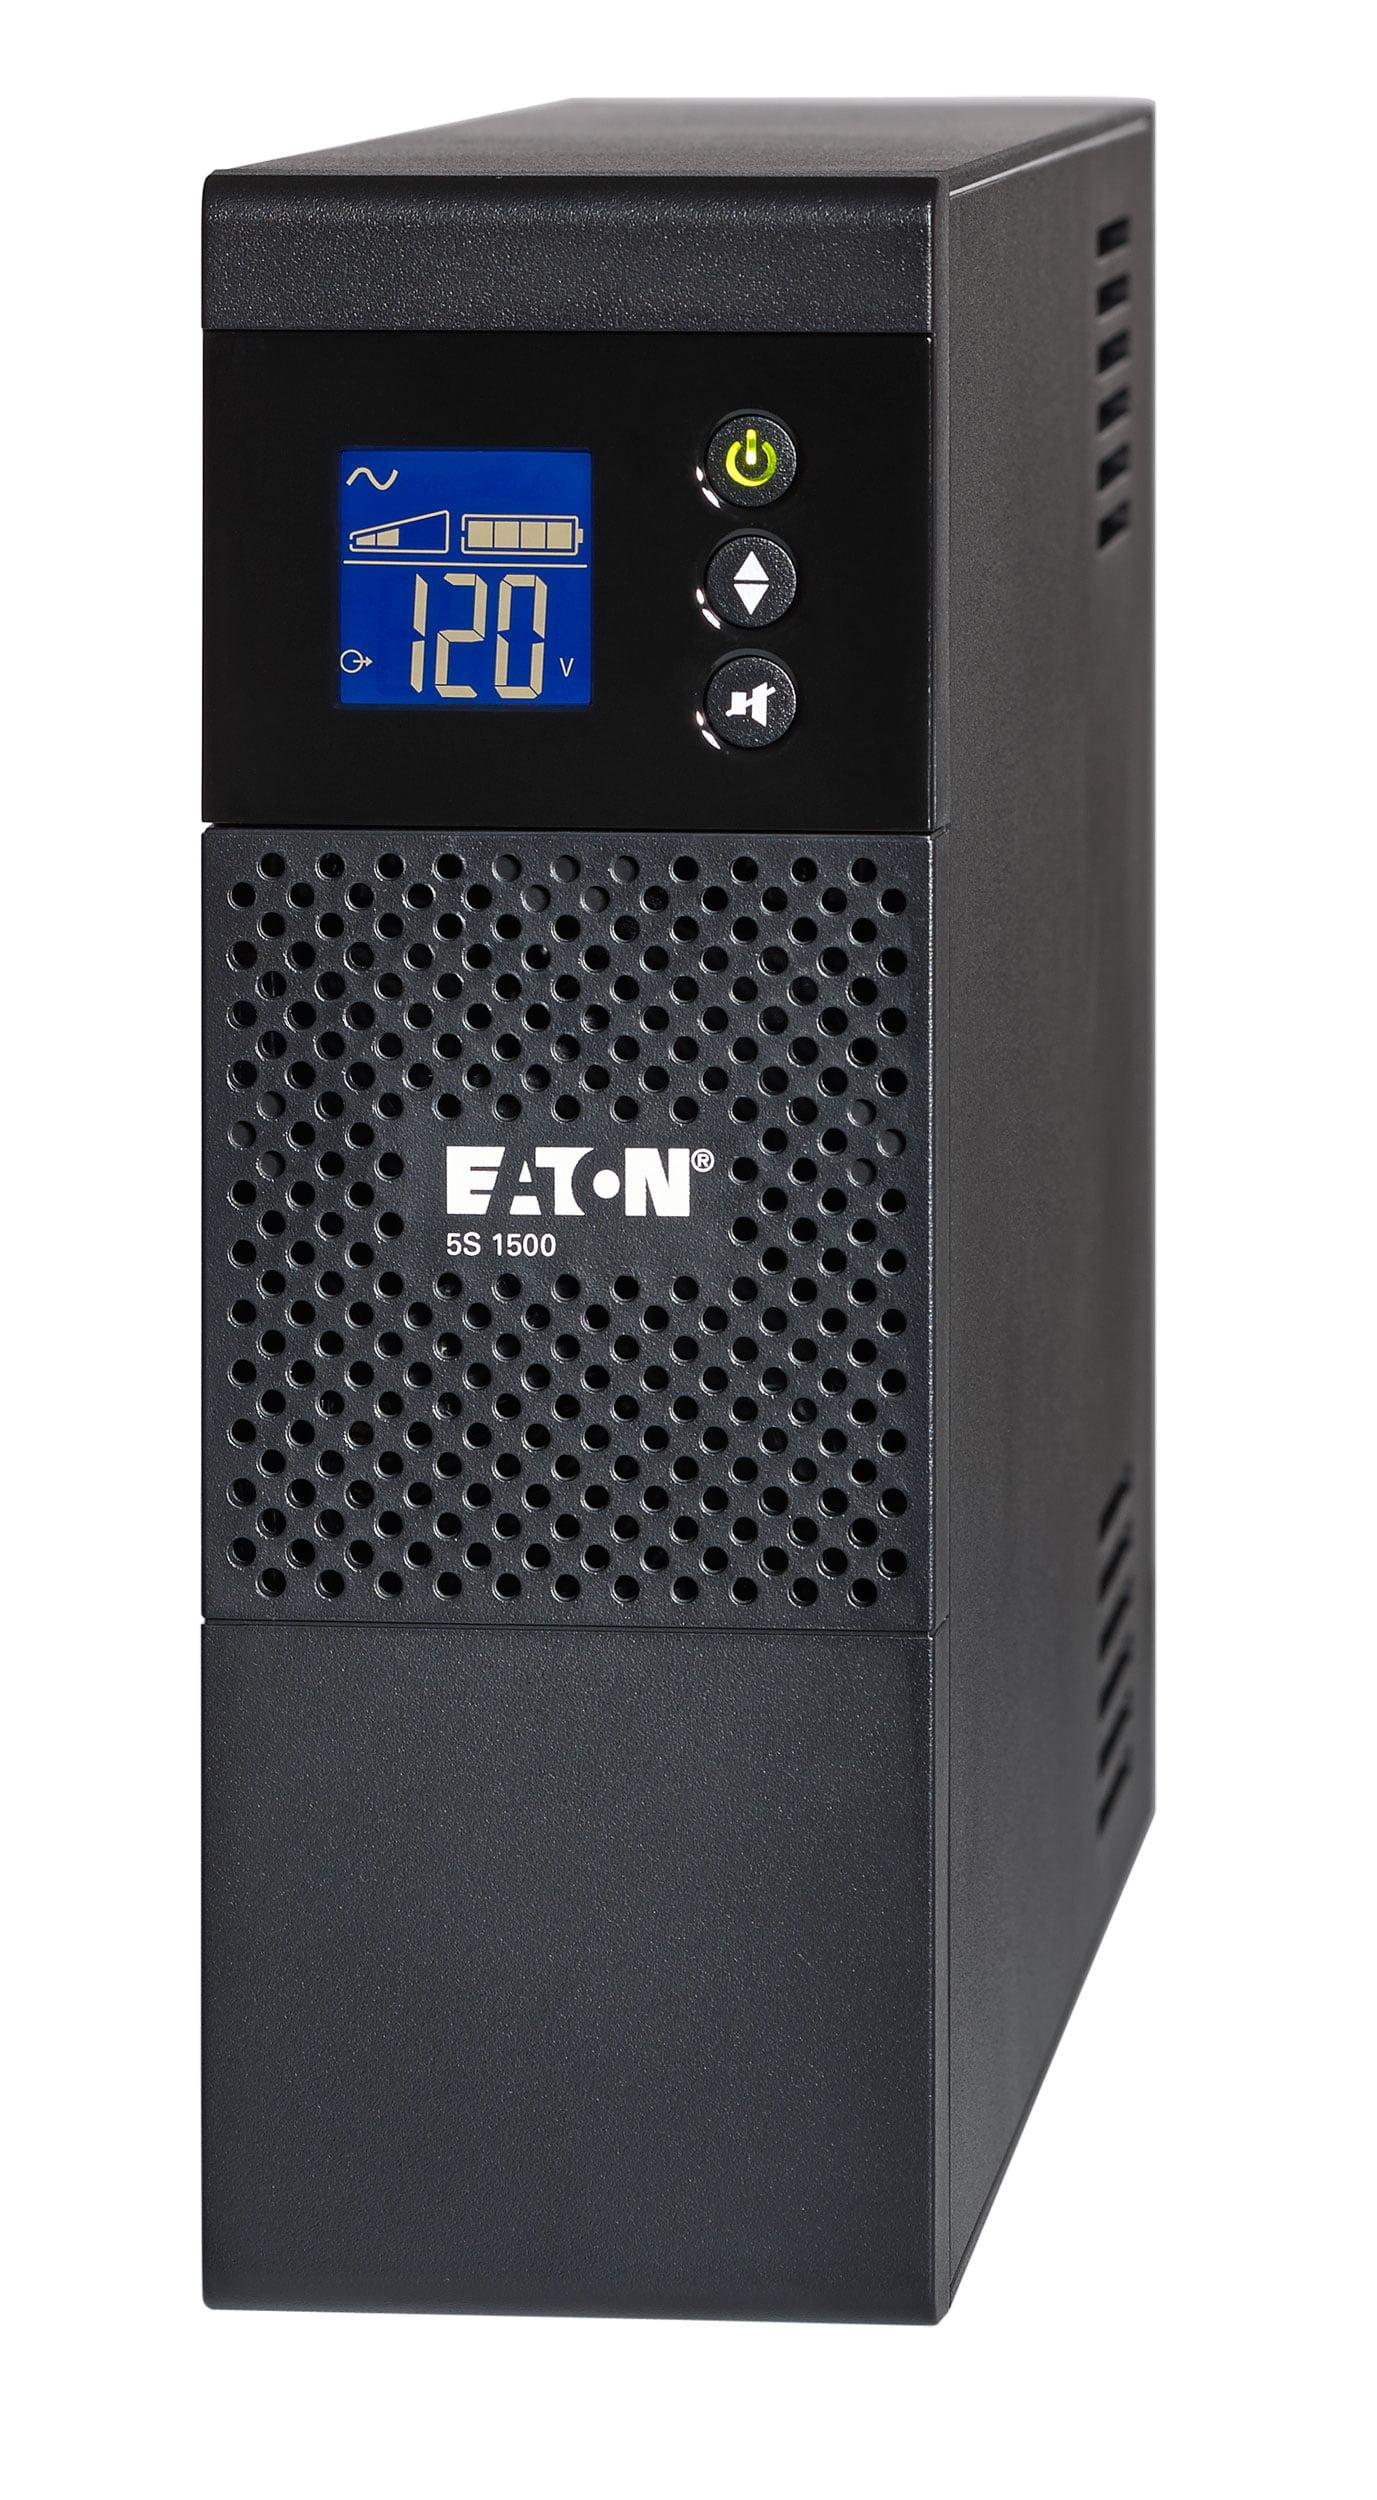 Eaton 5S Lithium-Ion UPS